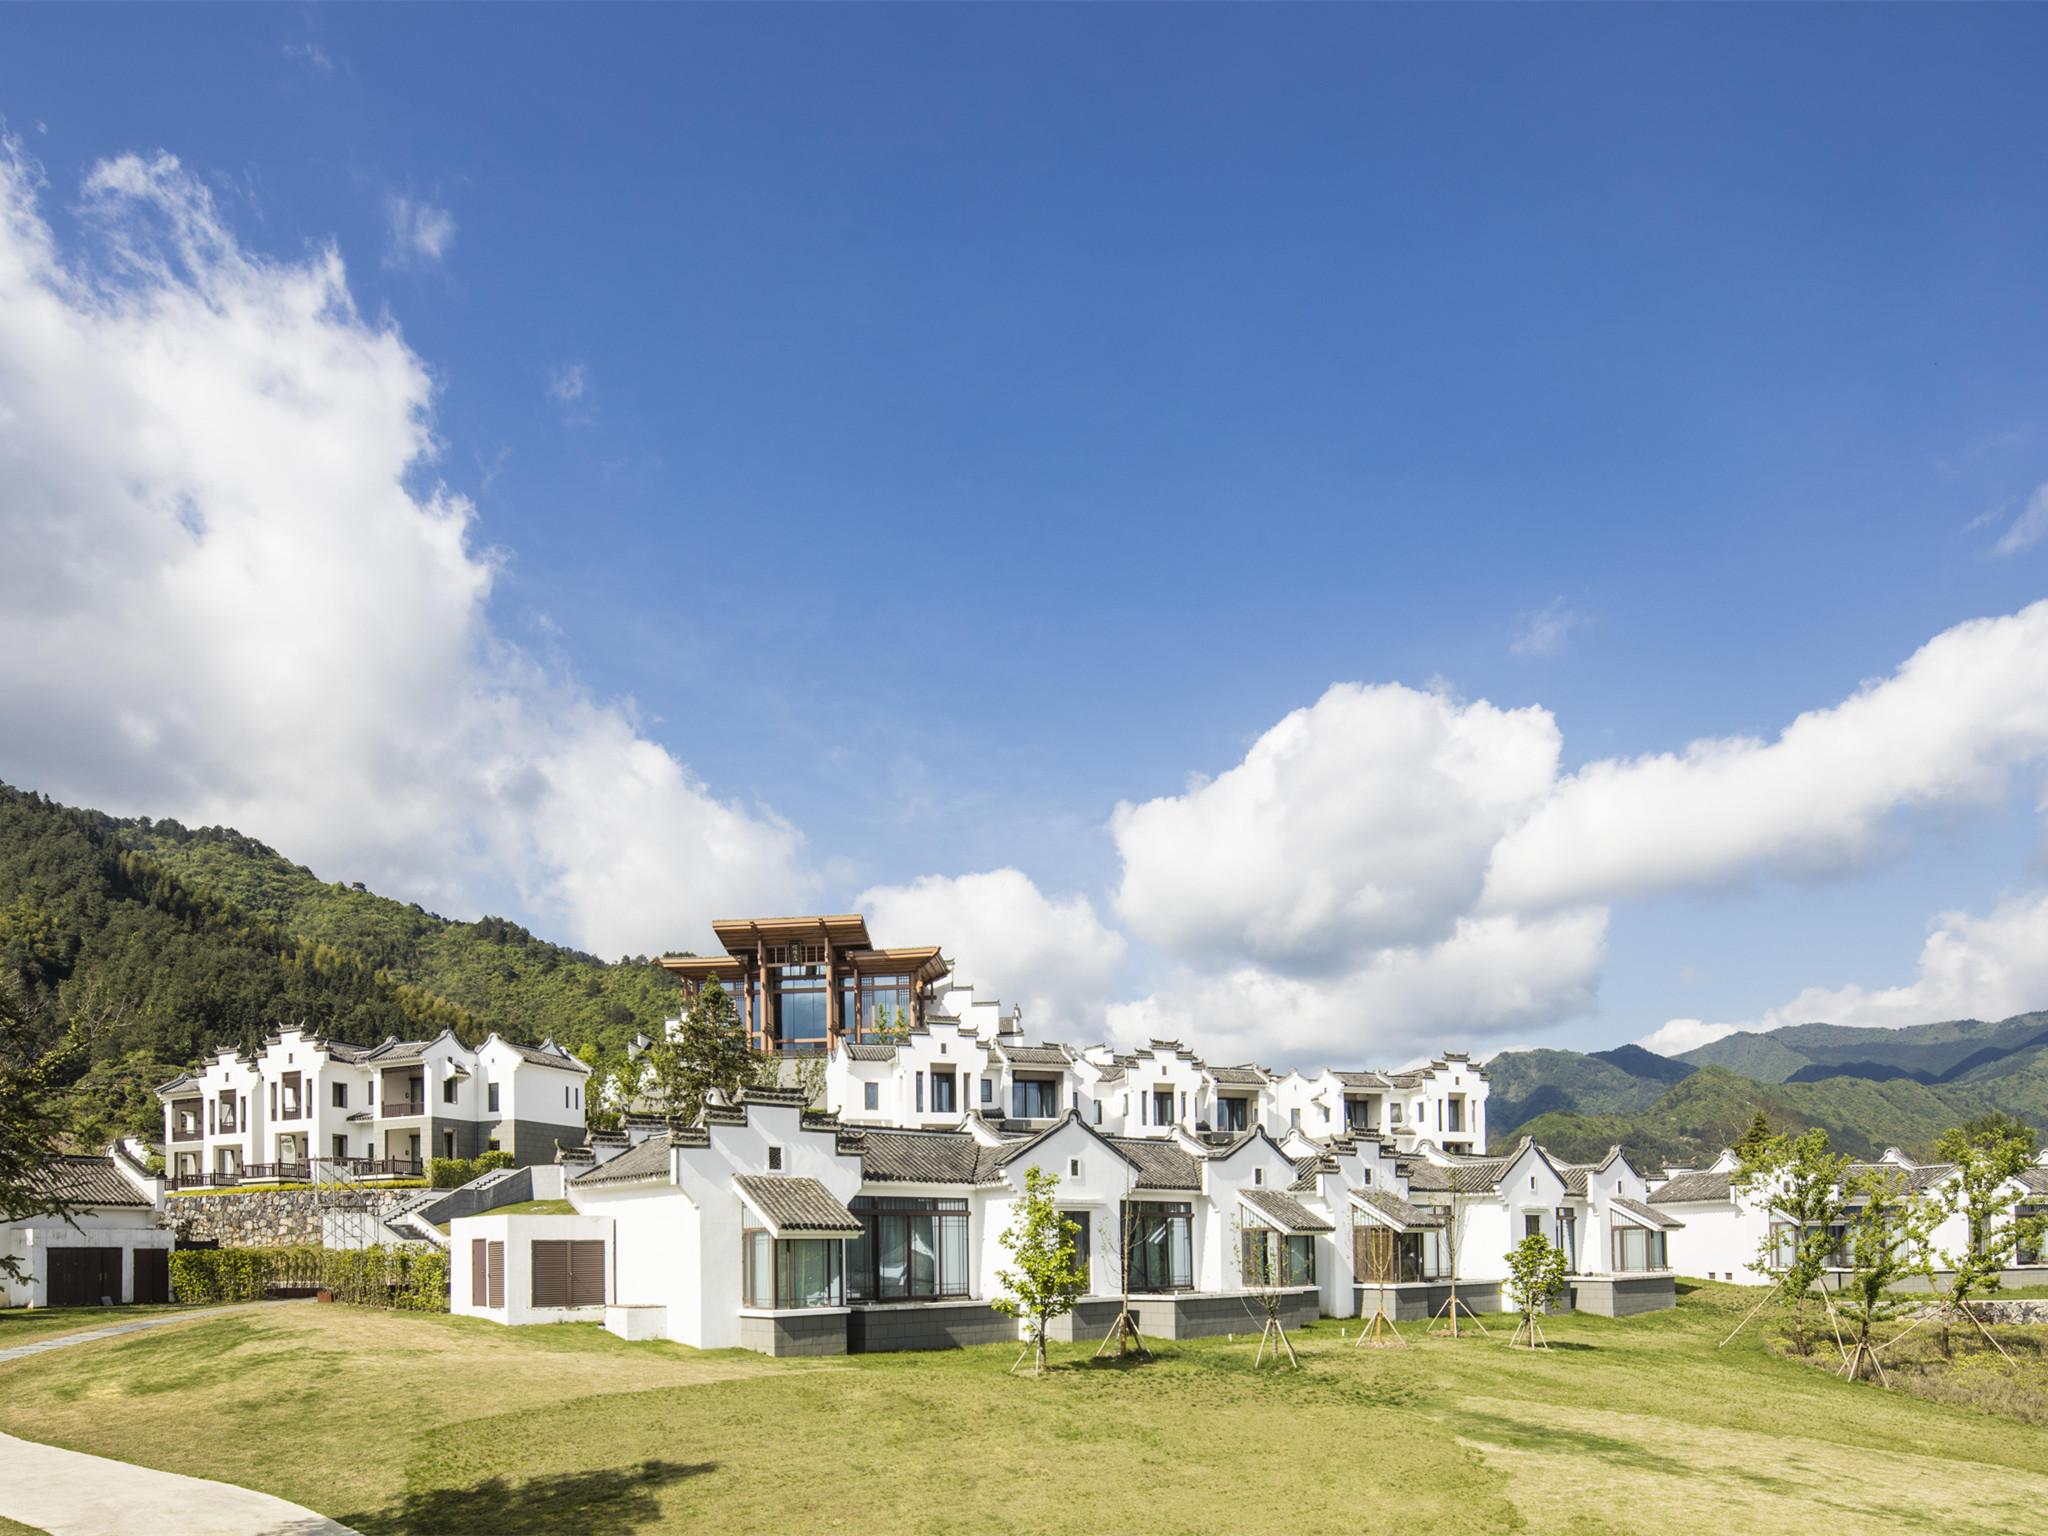 Hotel - Banyan Tree Hungshan